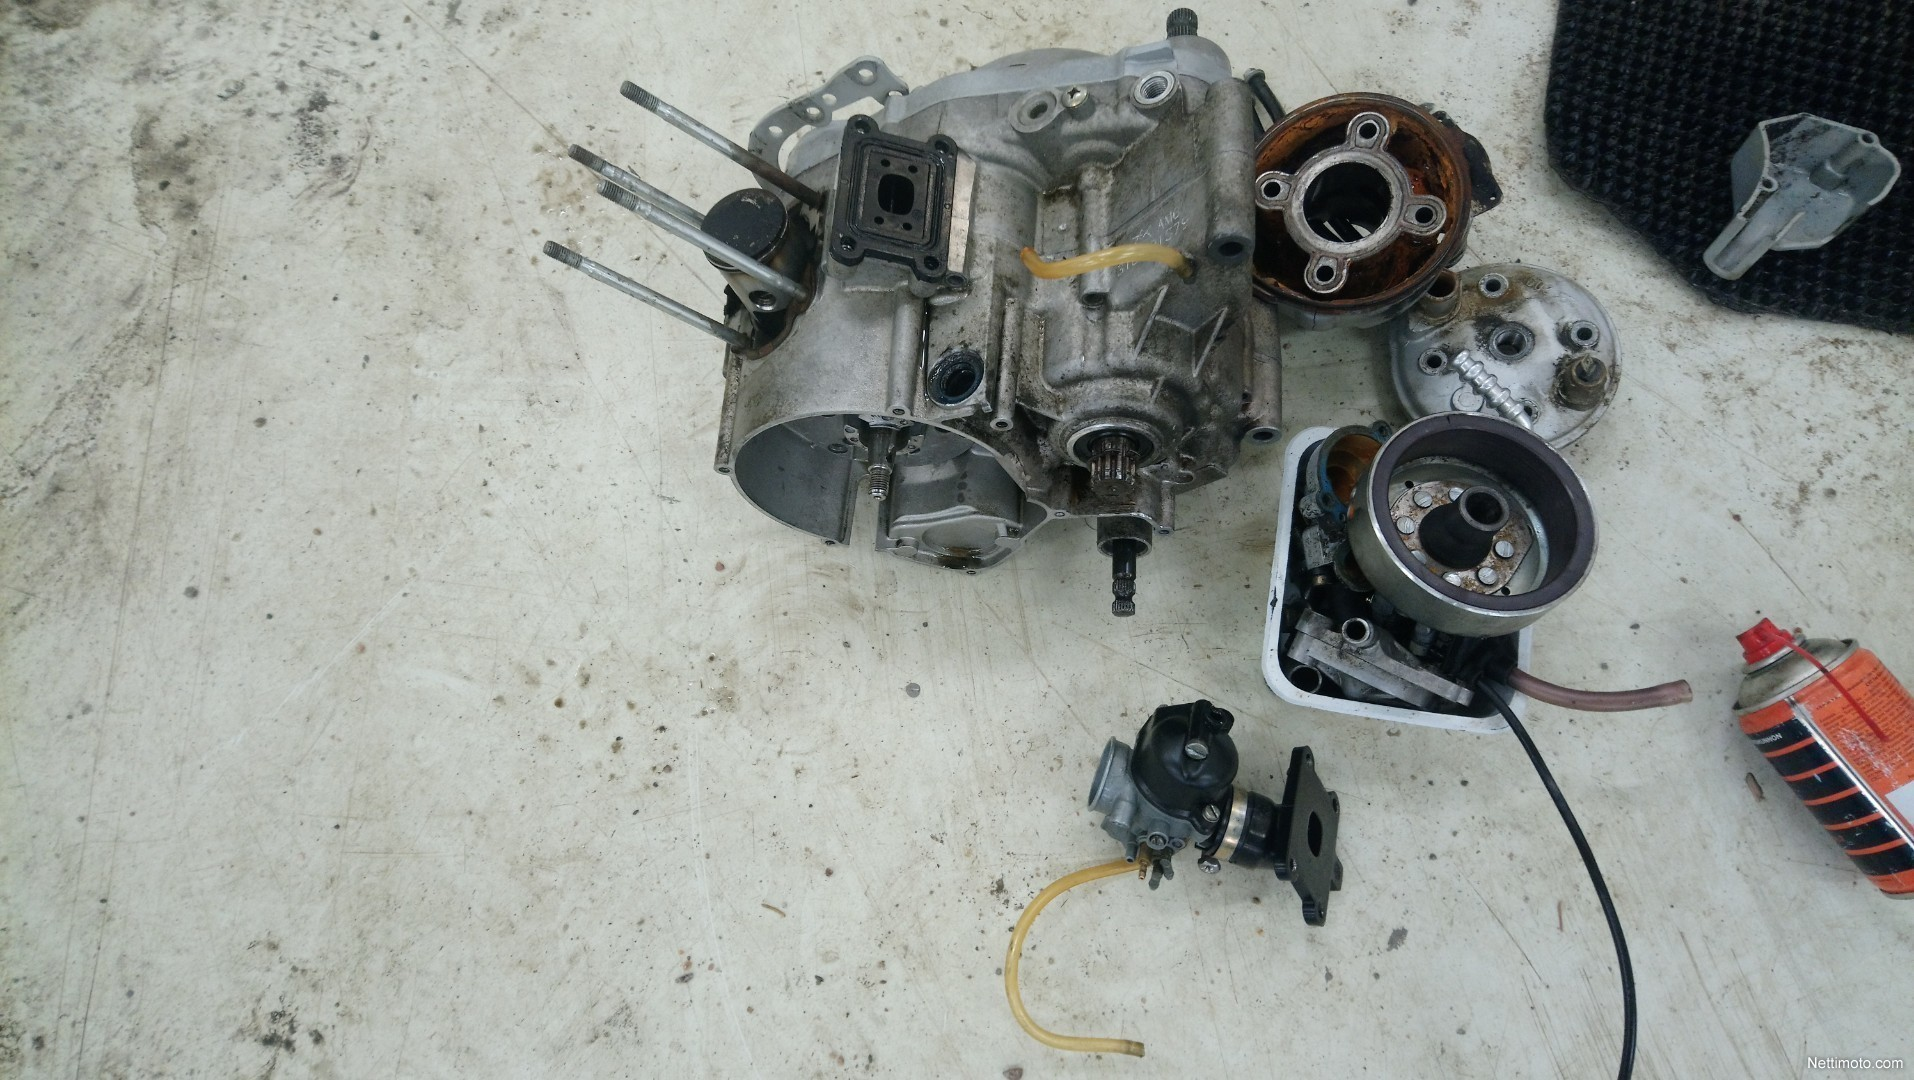 Astonishing Peugeot Xps 50 Cm3 2005 Aanekoski Moped Nettimoto Wiring 101 Ferenstreekradiomeanderfmnl